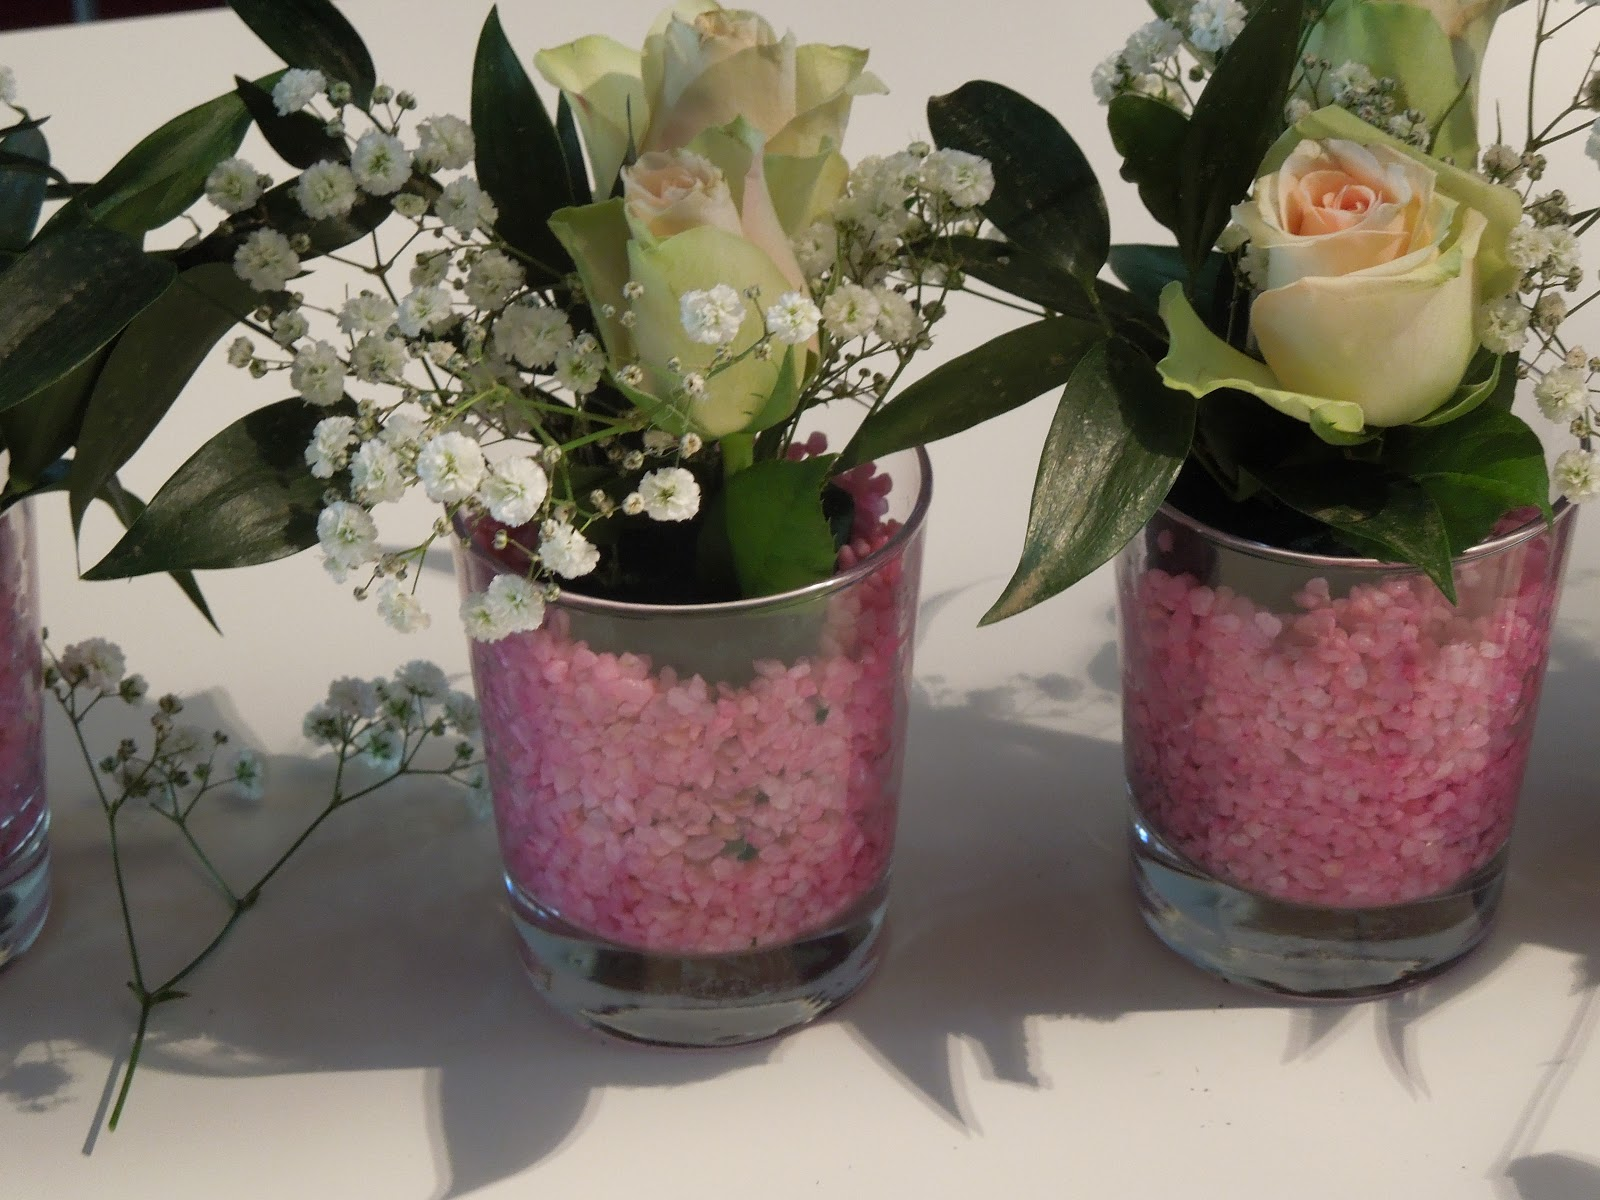 Beauty more alles was frau braucht blumengestecke - Blumengestecke selber machen ...